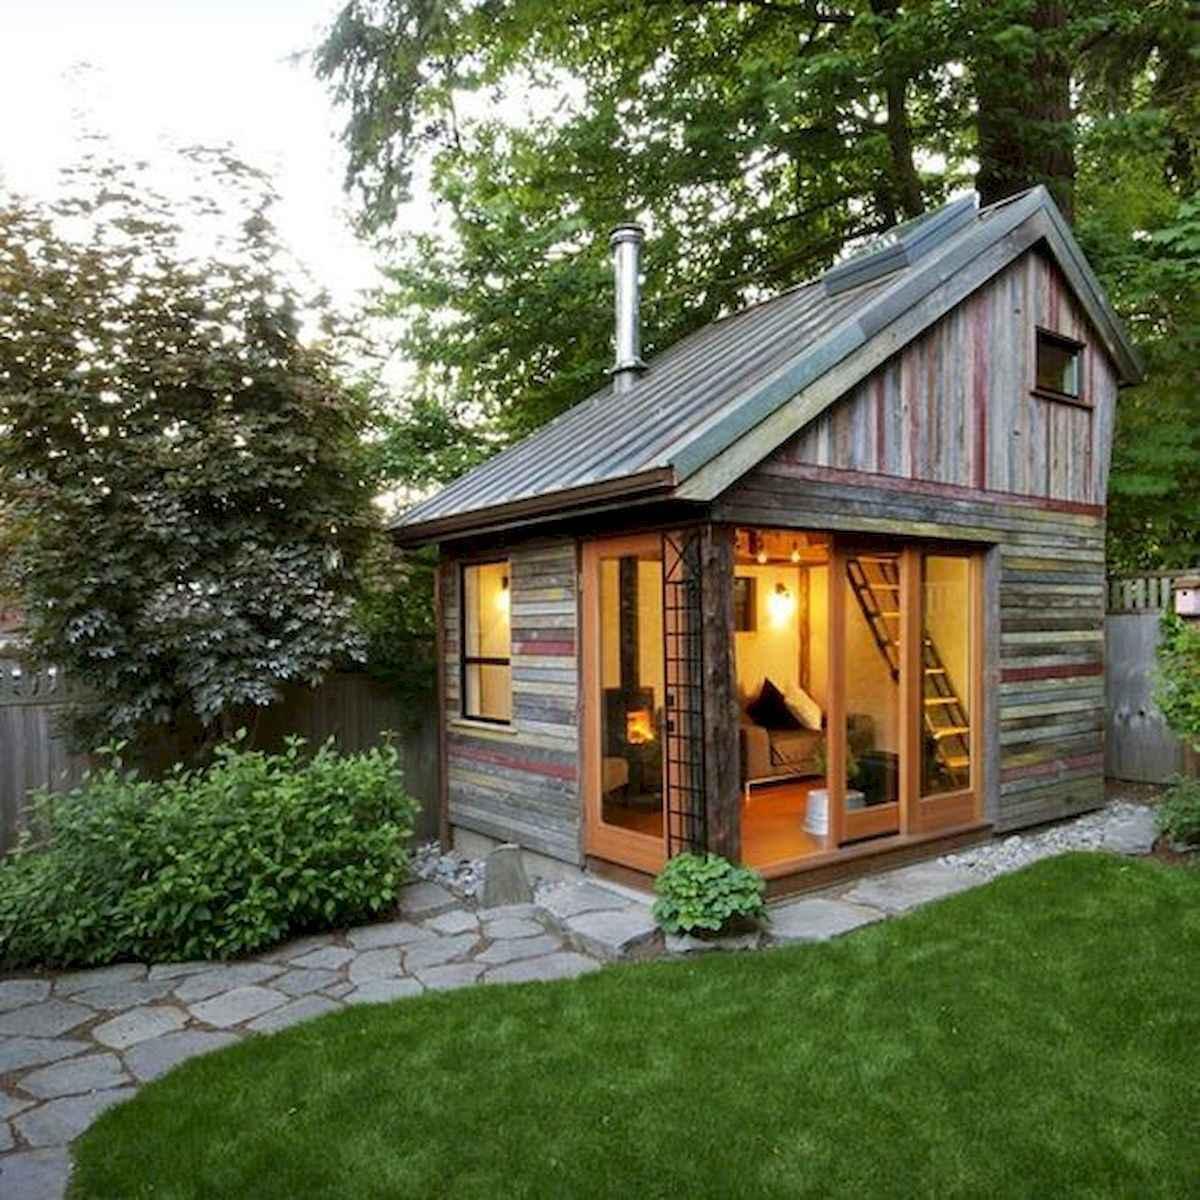 70 Fantastic Small Log Cabin Homes Design Ideas (59)